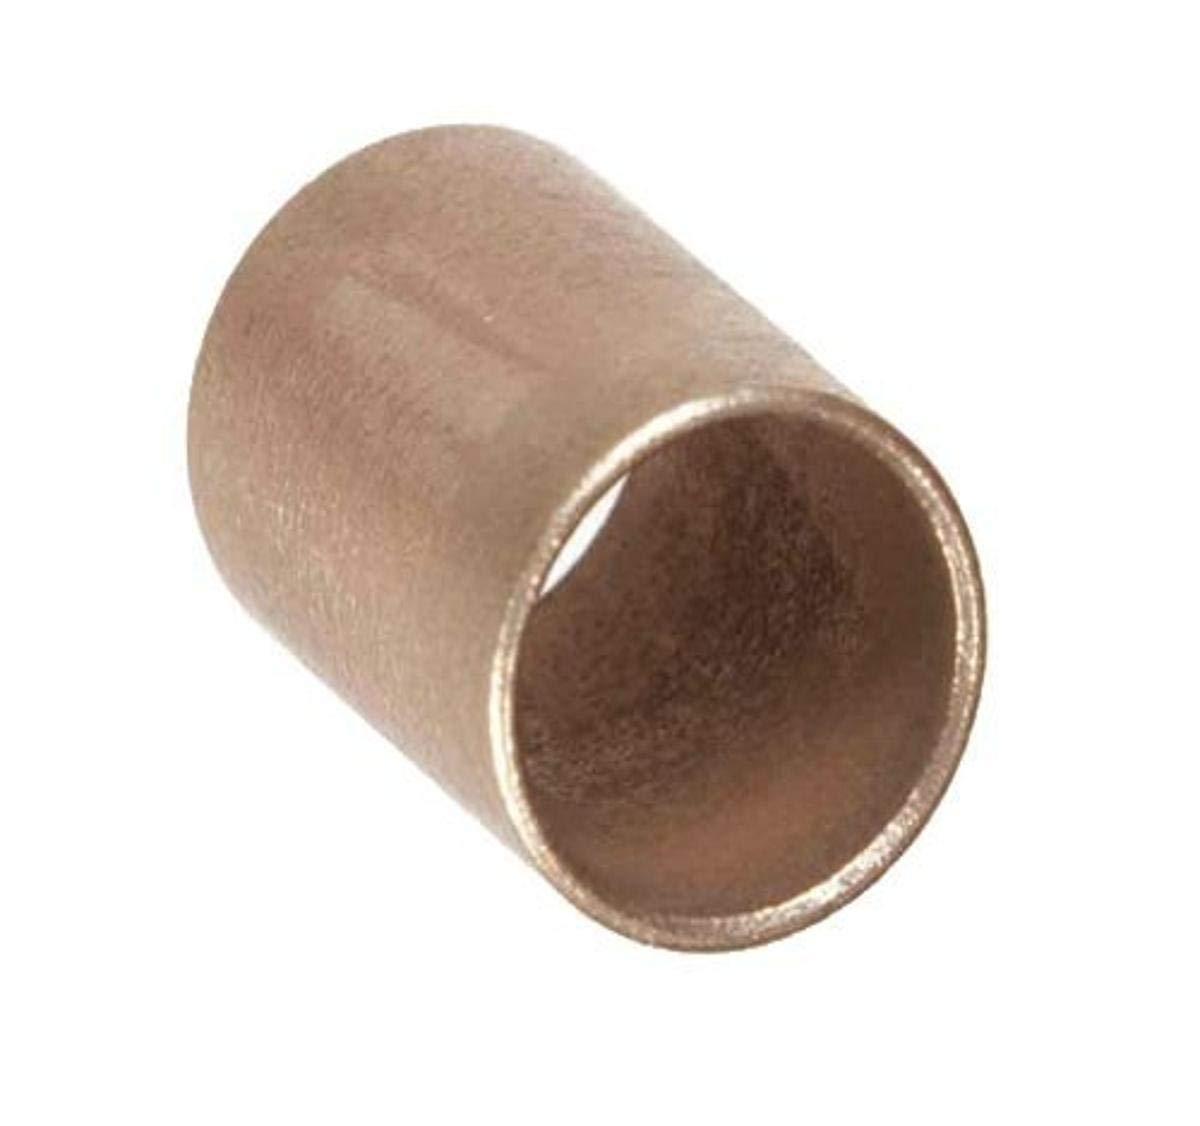 Isostatics 101053-10 AA-335-5 SAE841 National uniform free shipping Bronz Ranking TOP7 Oilube Powdered Metal